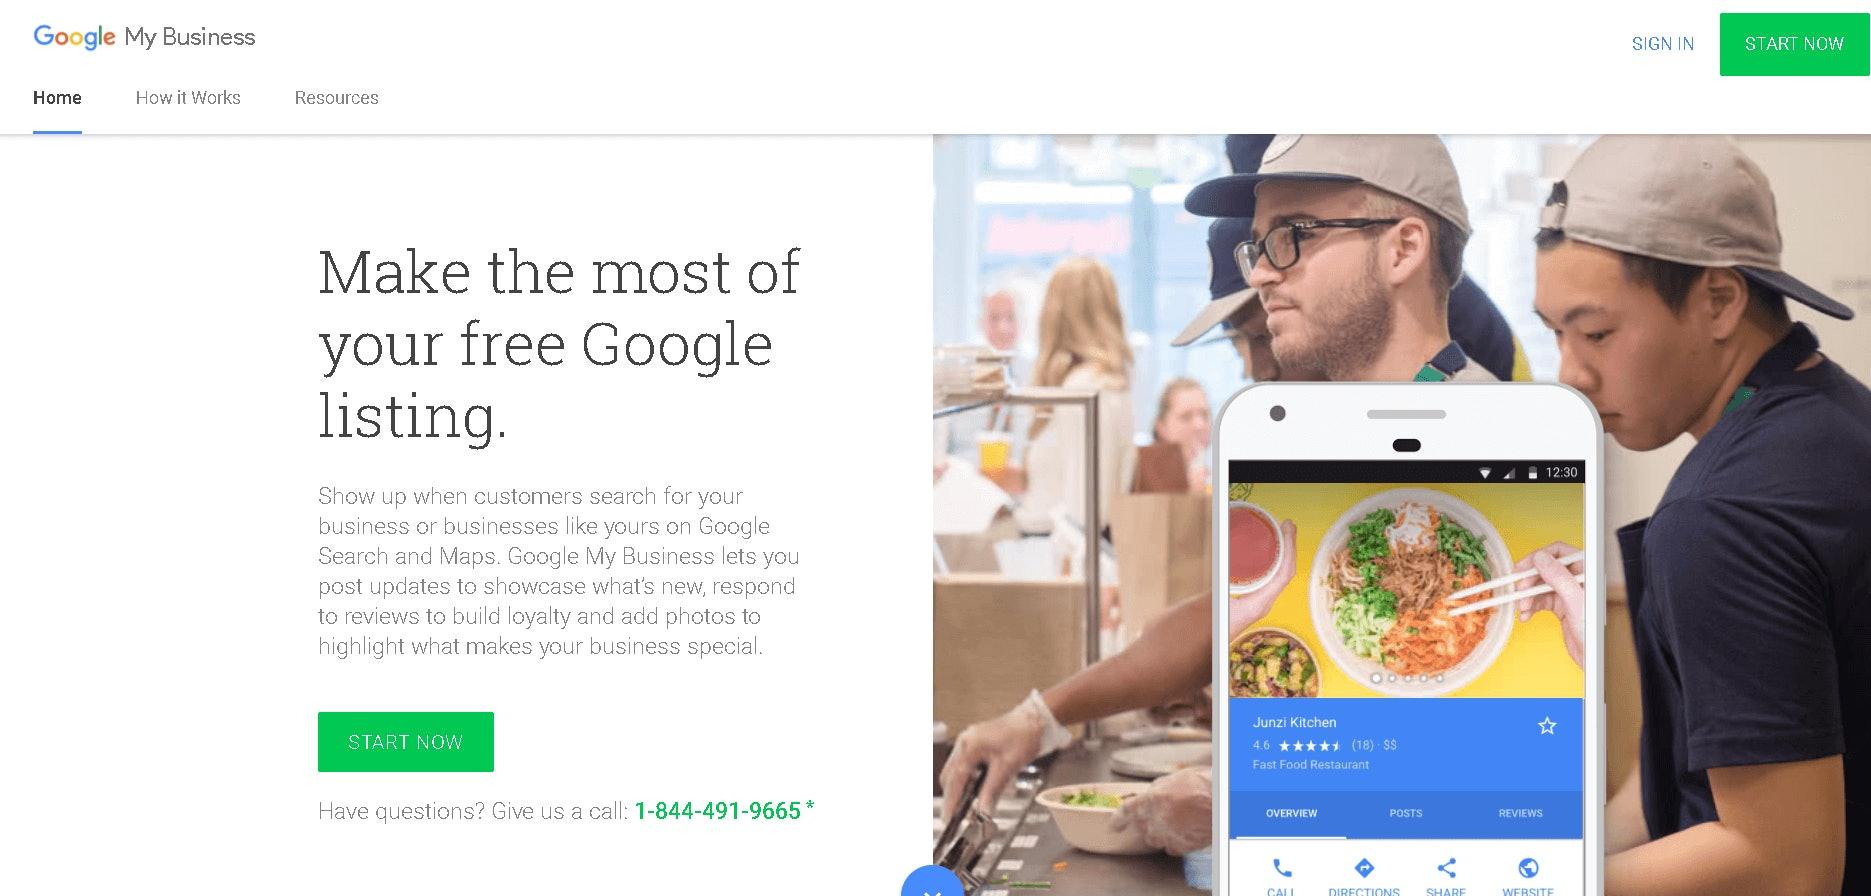 Google Business login